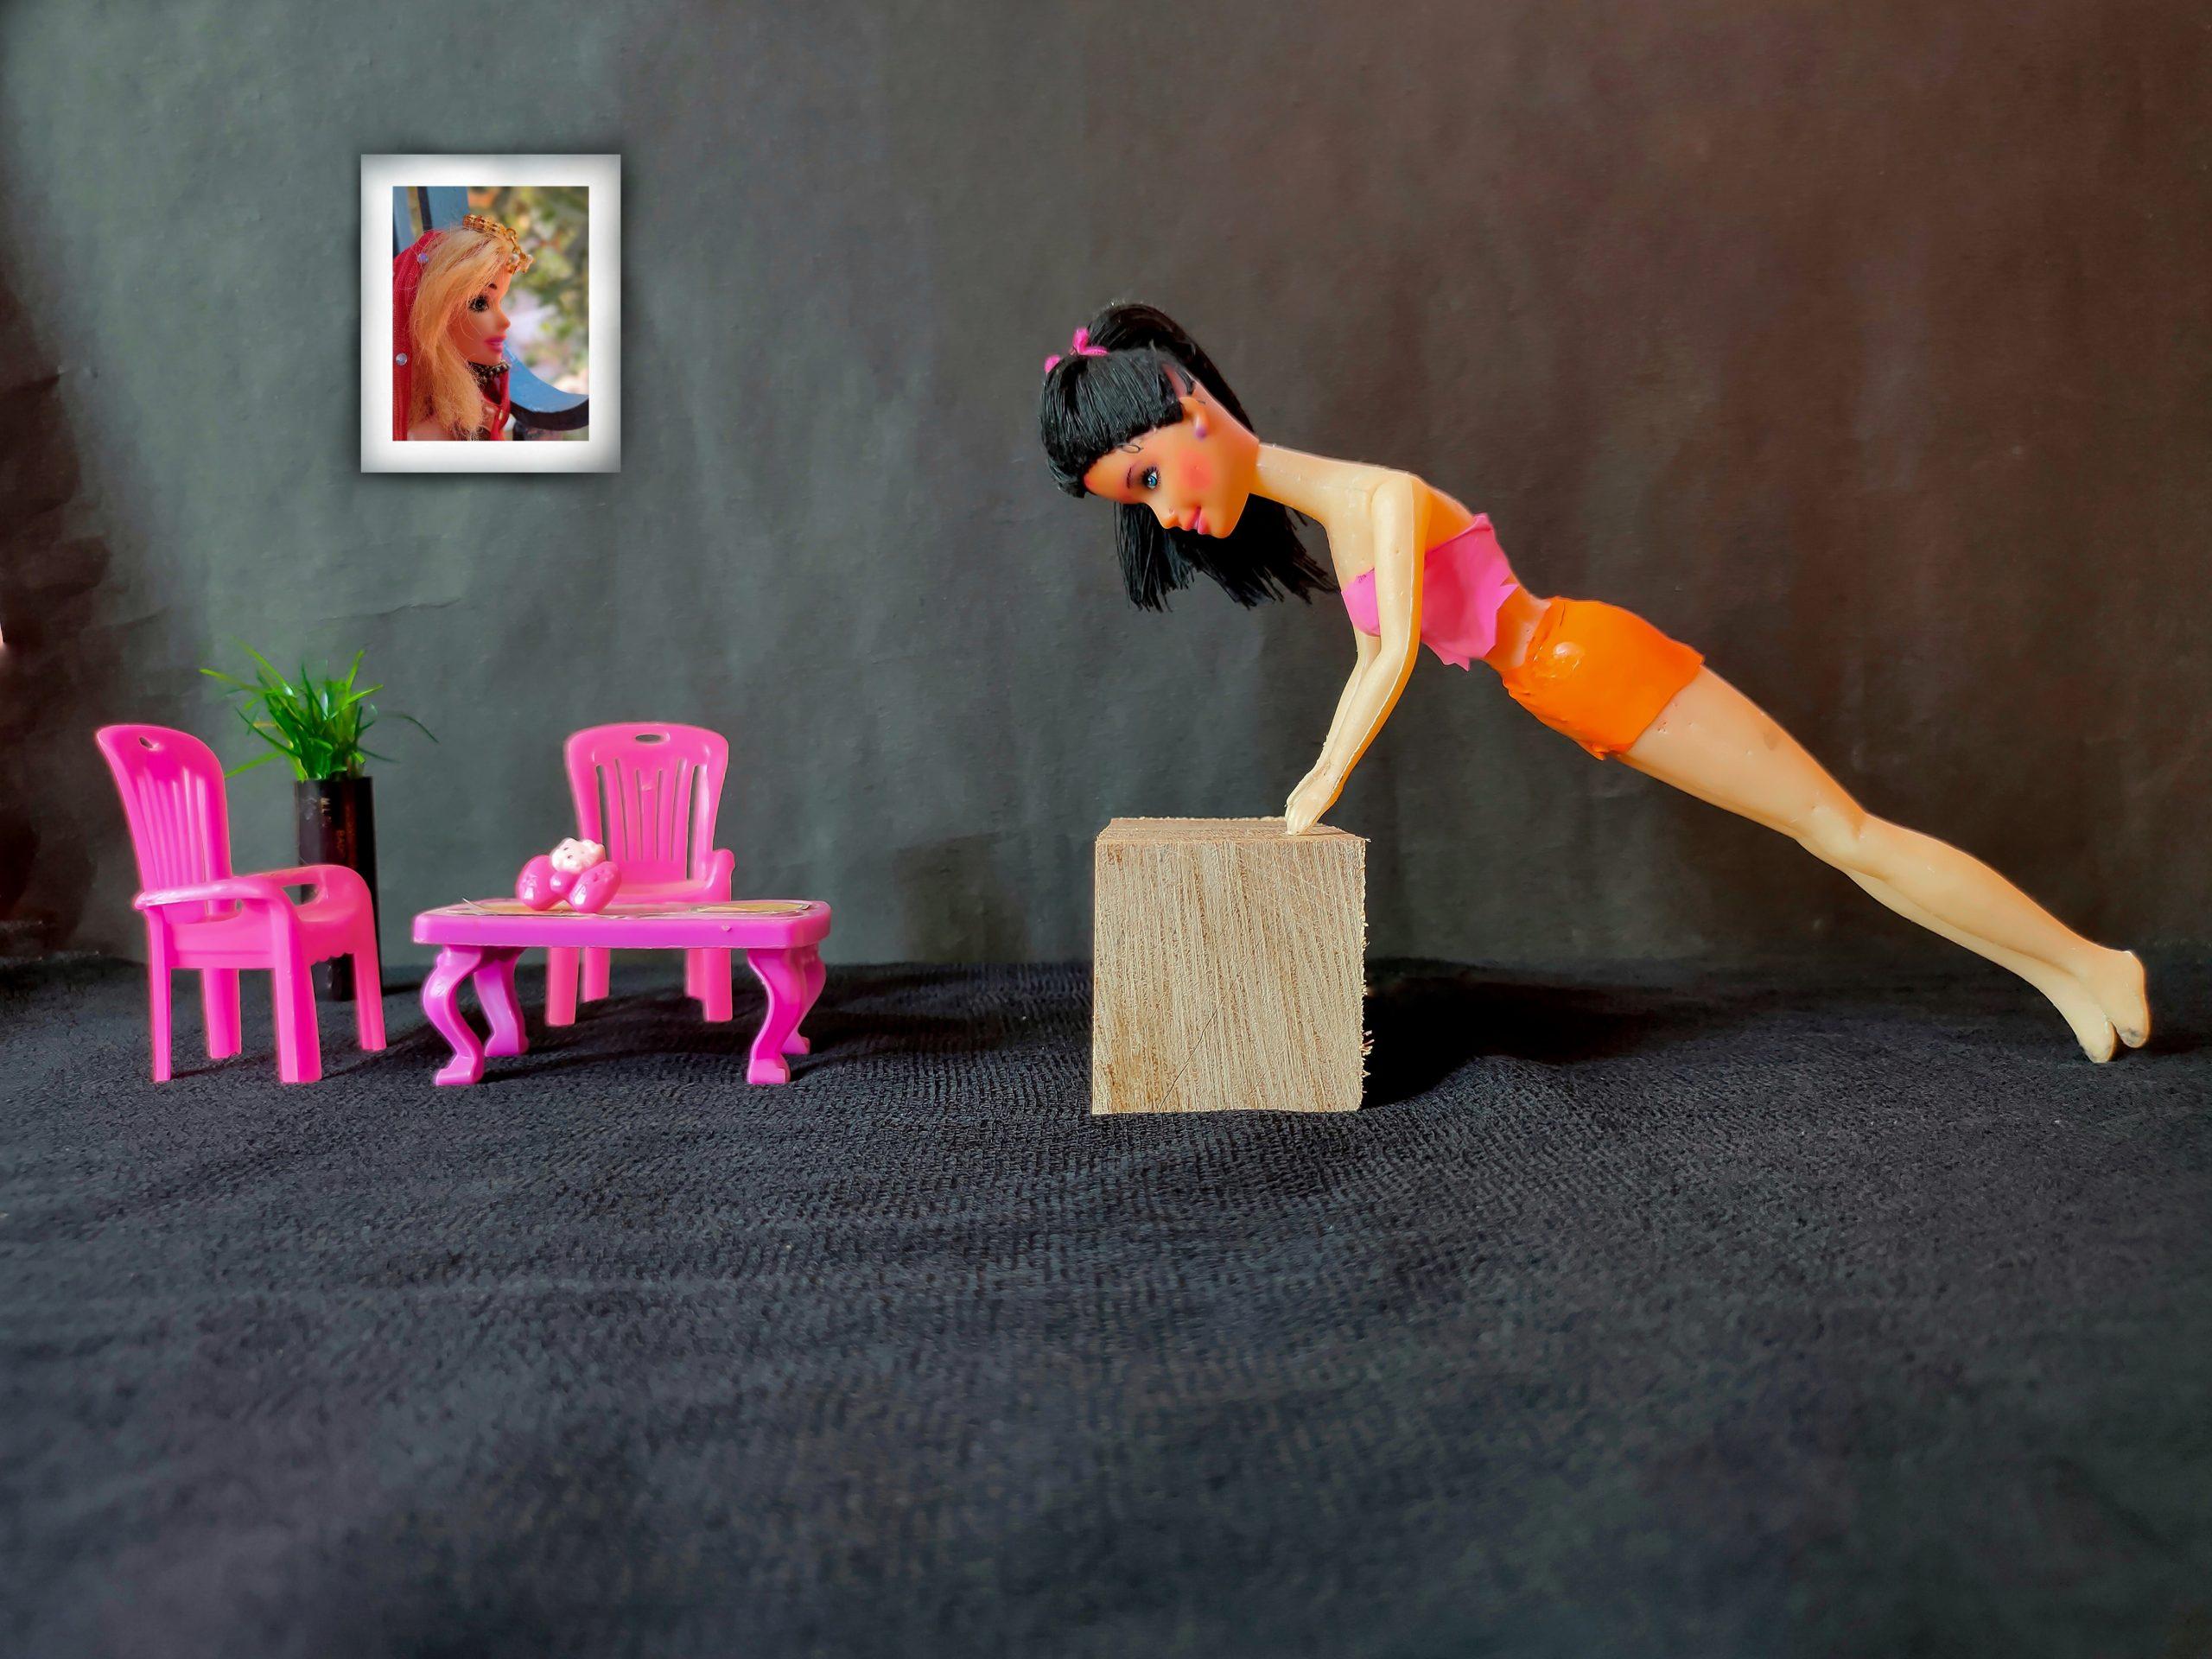 A doll doing pushups